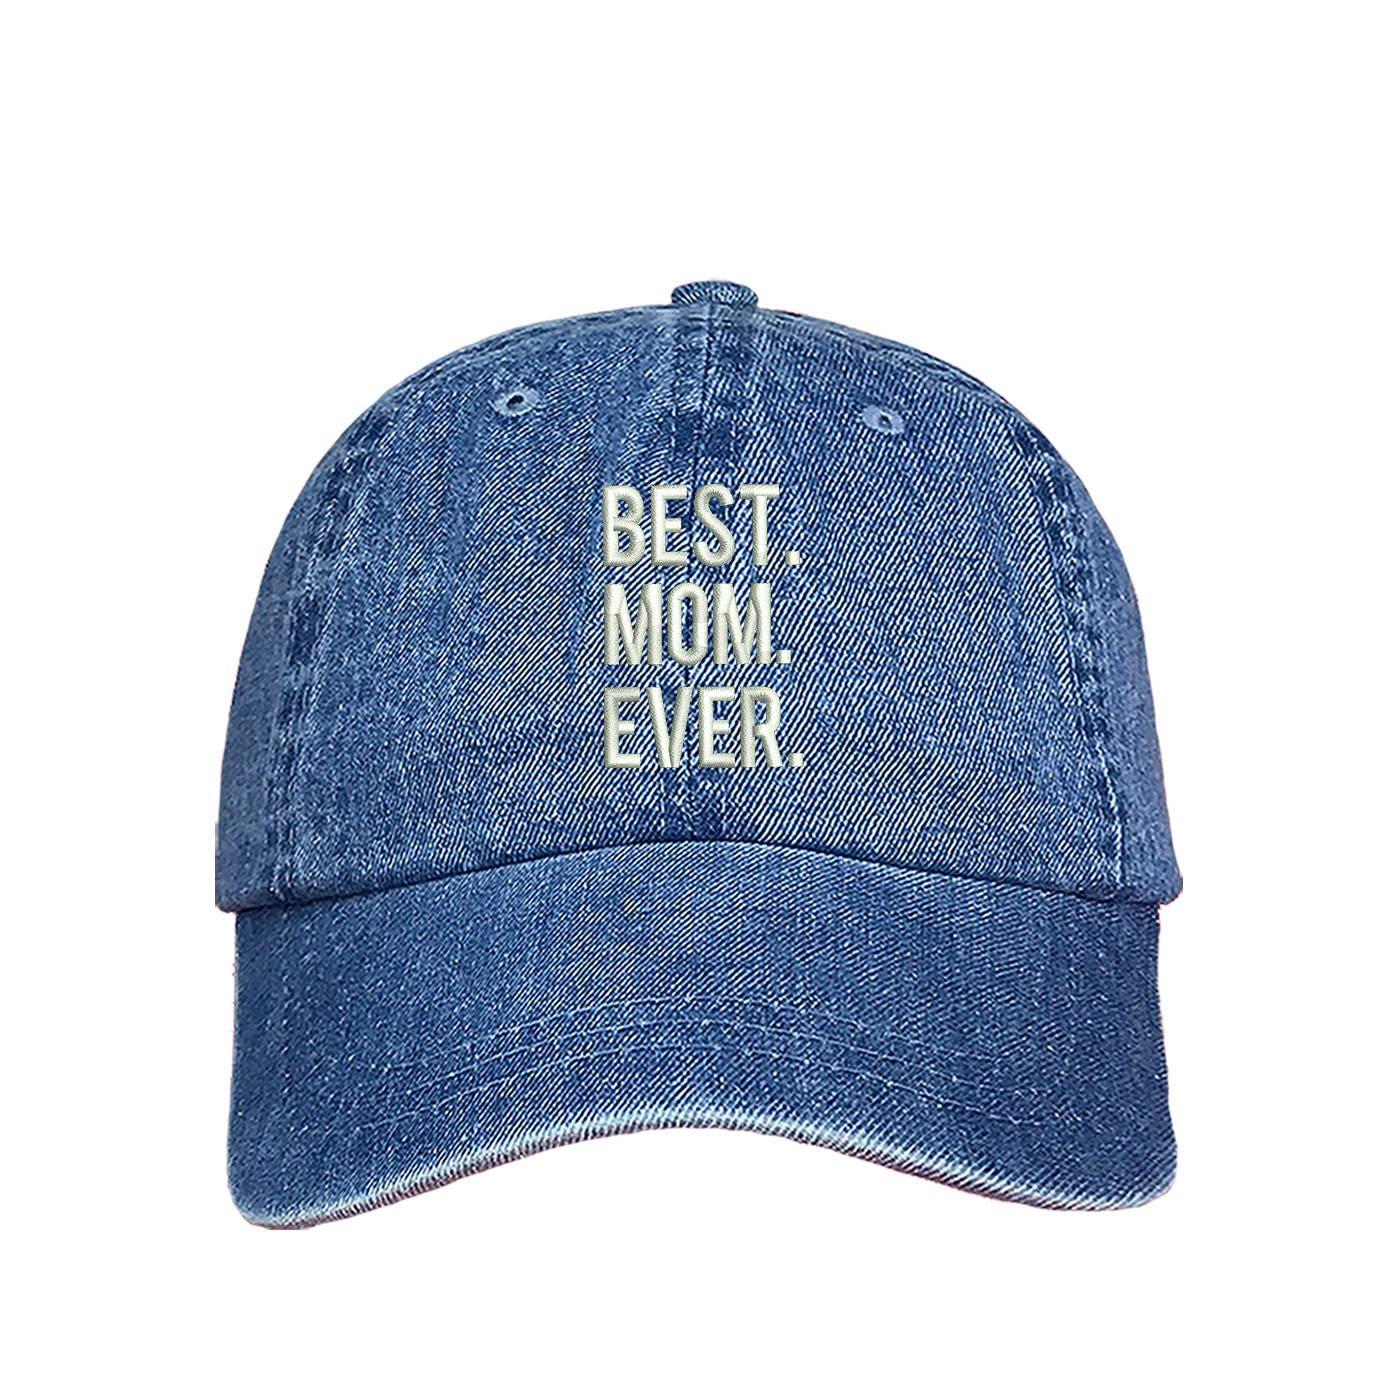 674b2e85686 ... Best Mom Dad Hat